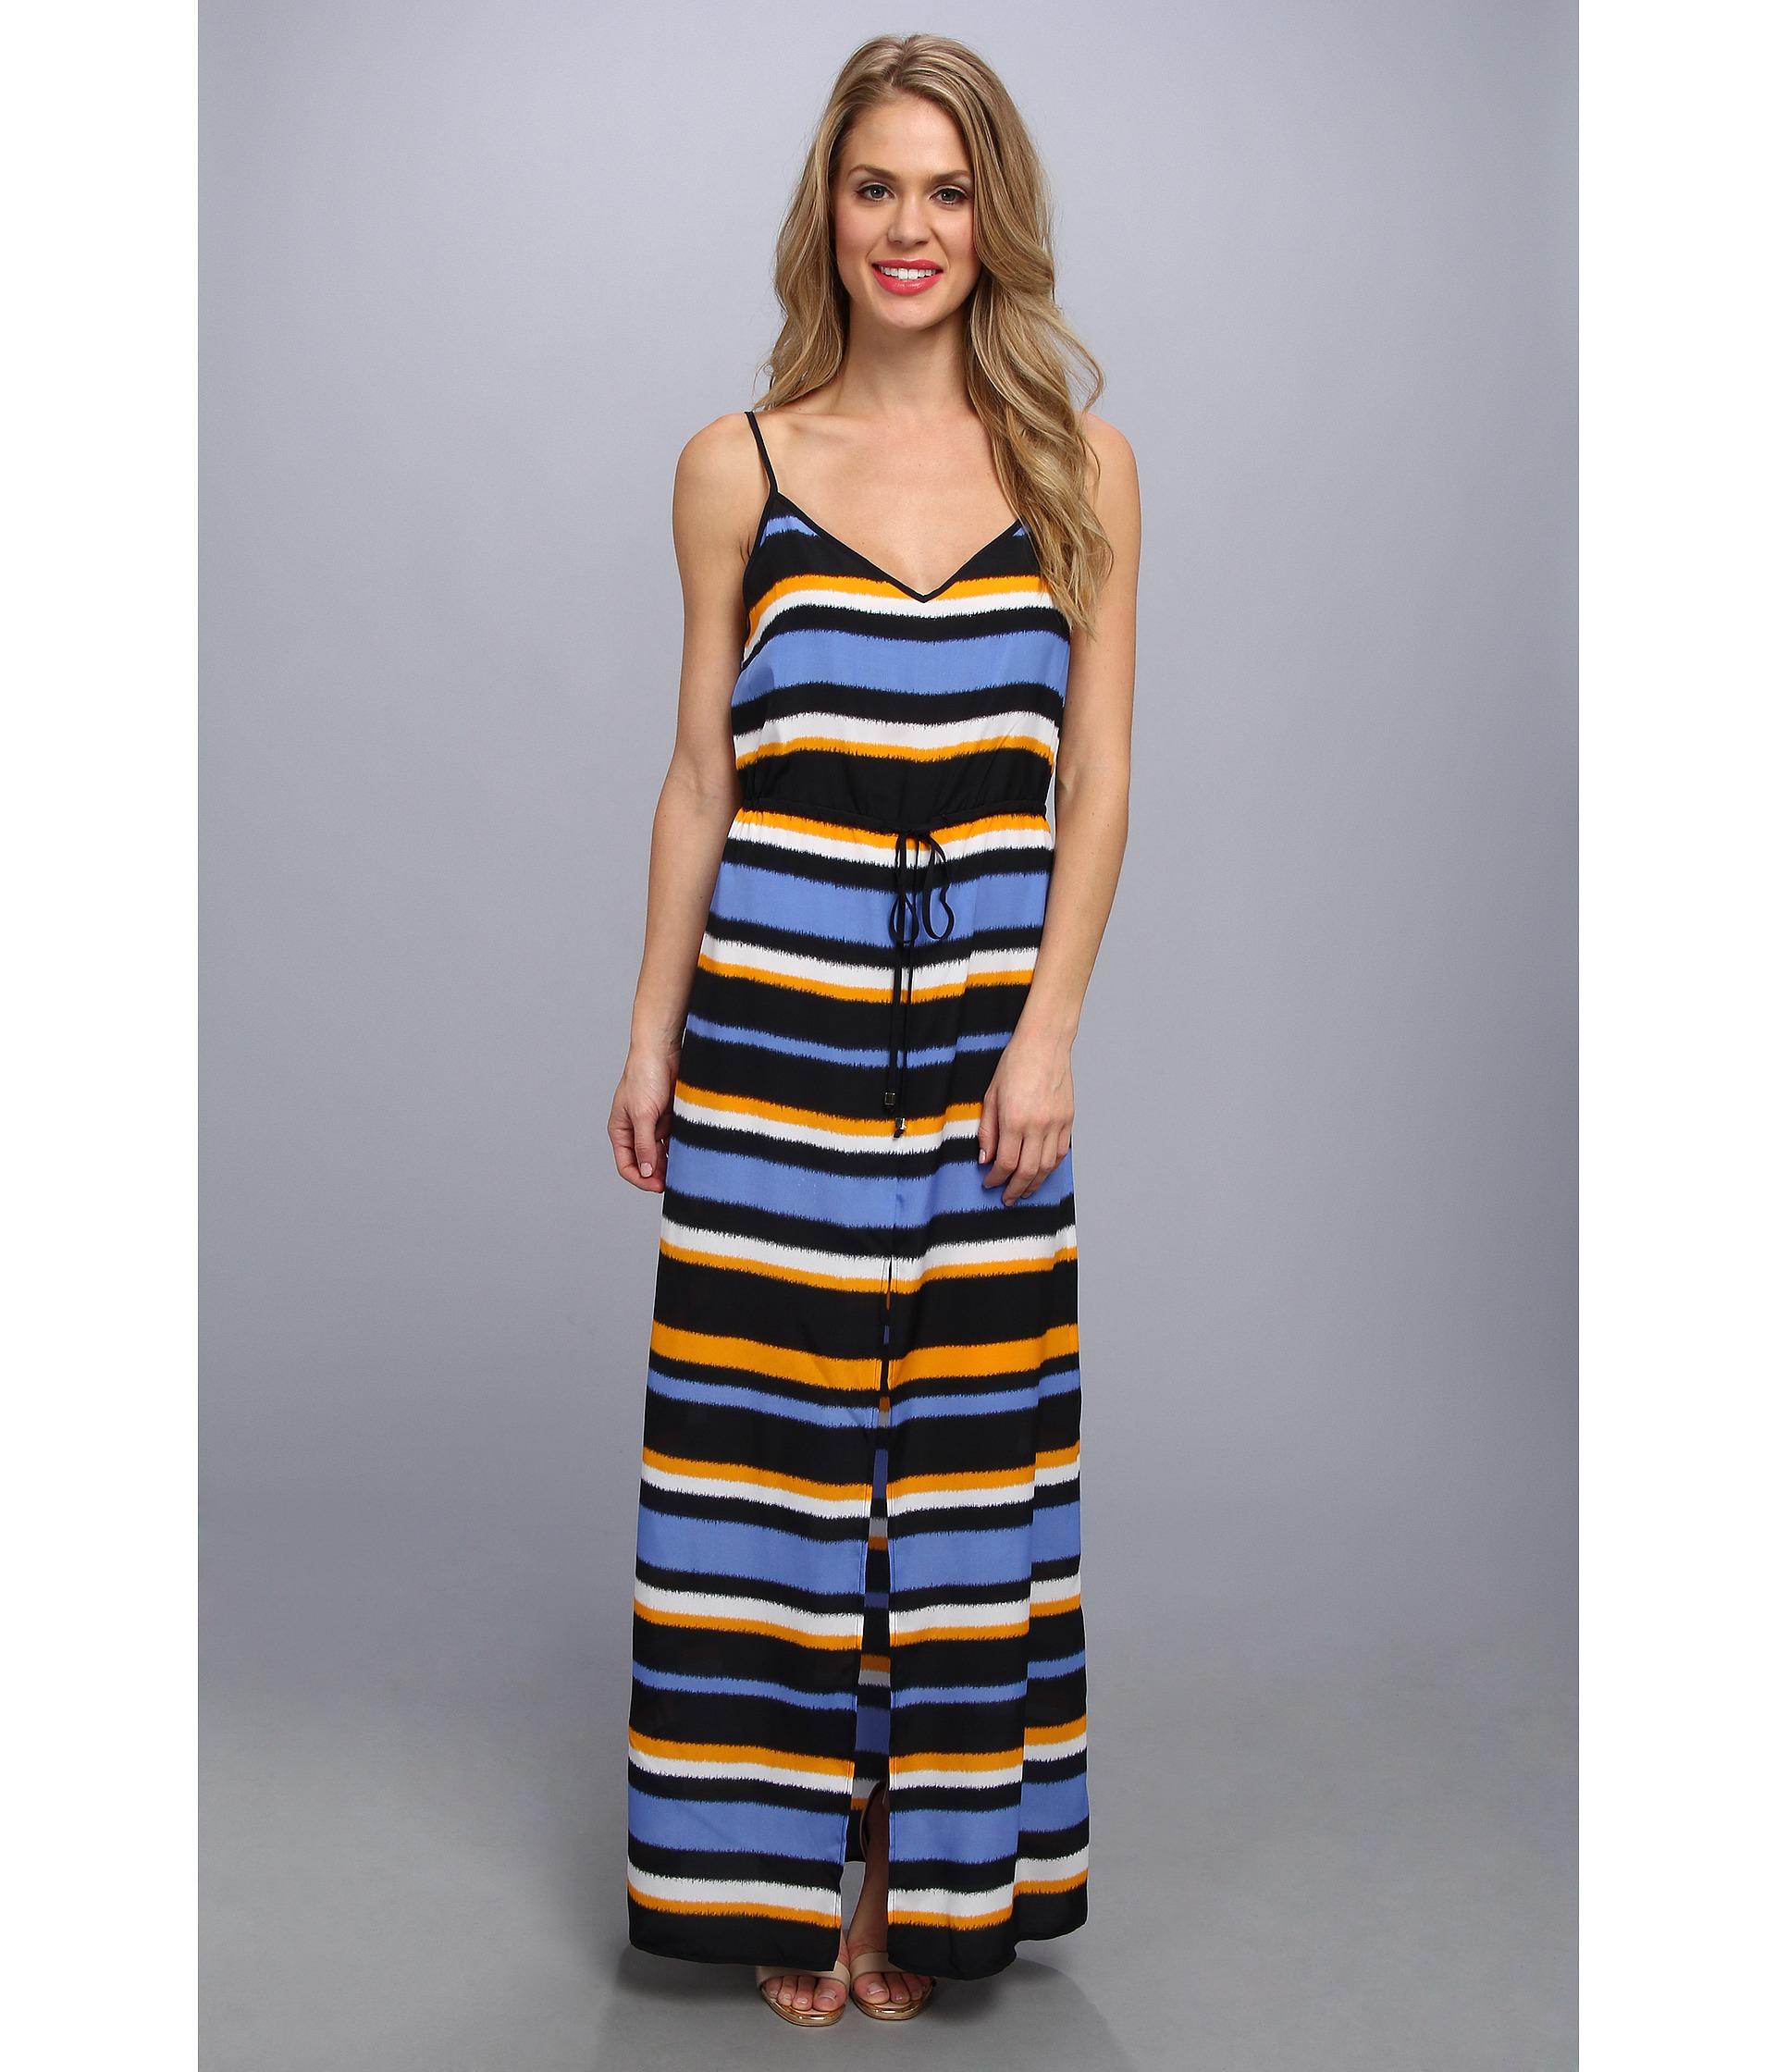 8a30d5a43b5 MICHAEL Michael Kors Striped Front Slit Maxi Dress in Blue - Lyst